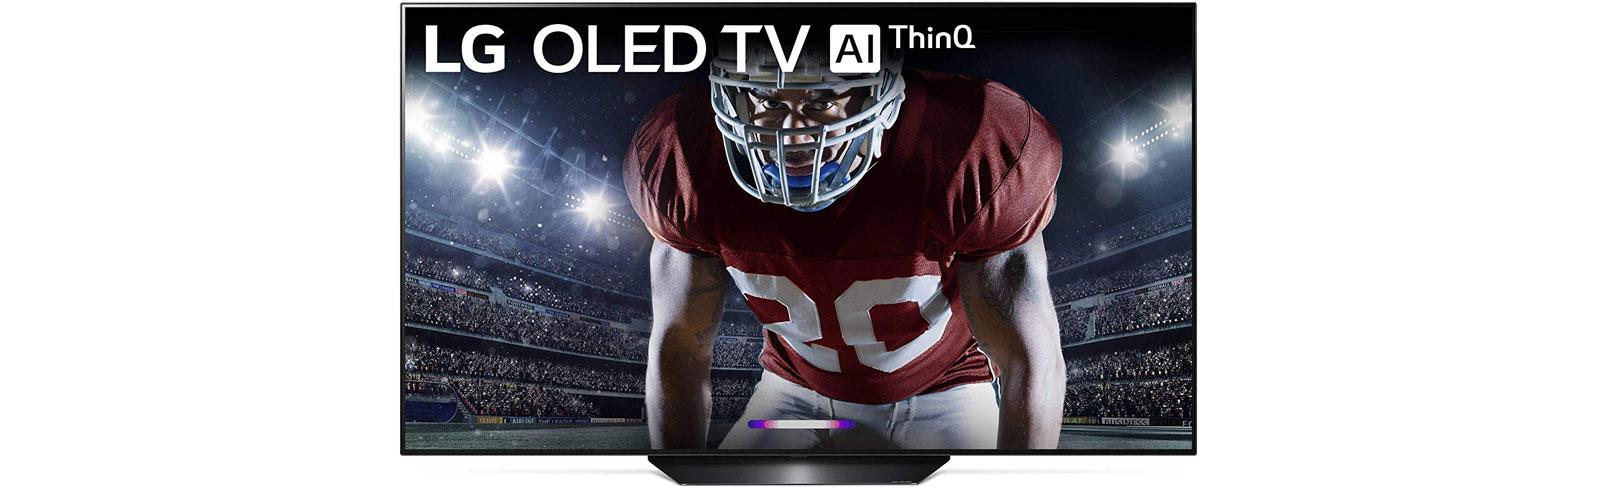 LG OLED55B9PUA and LG OLED65B9PUA get a healthy discount in the US until February 2